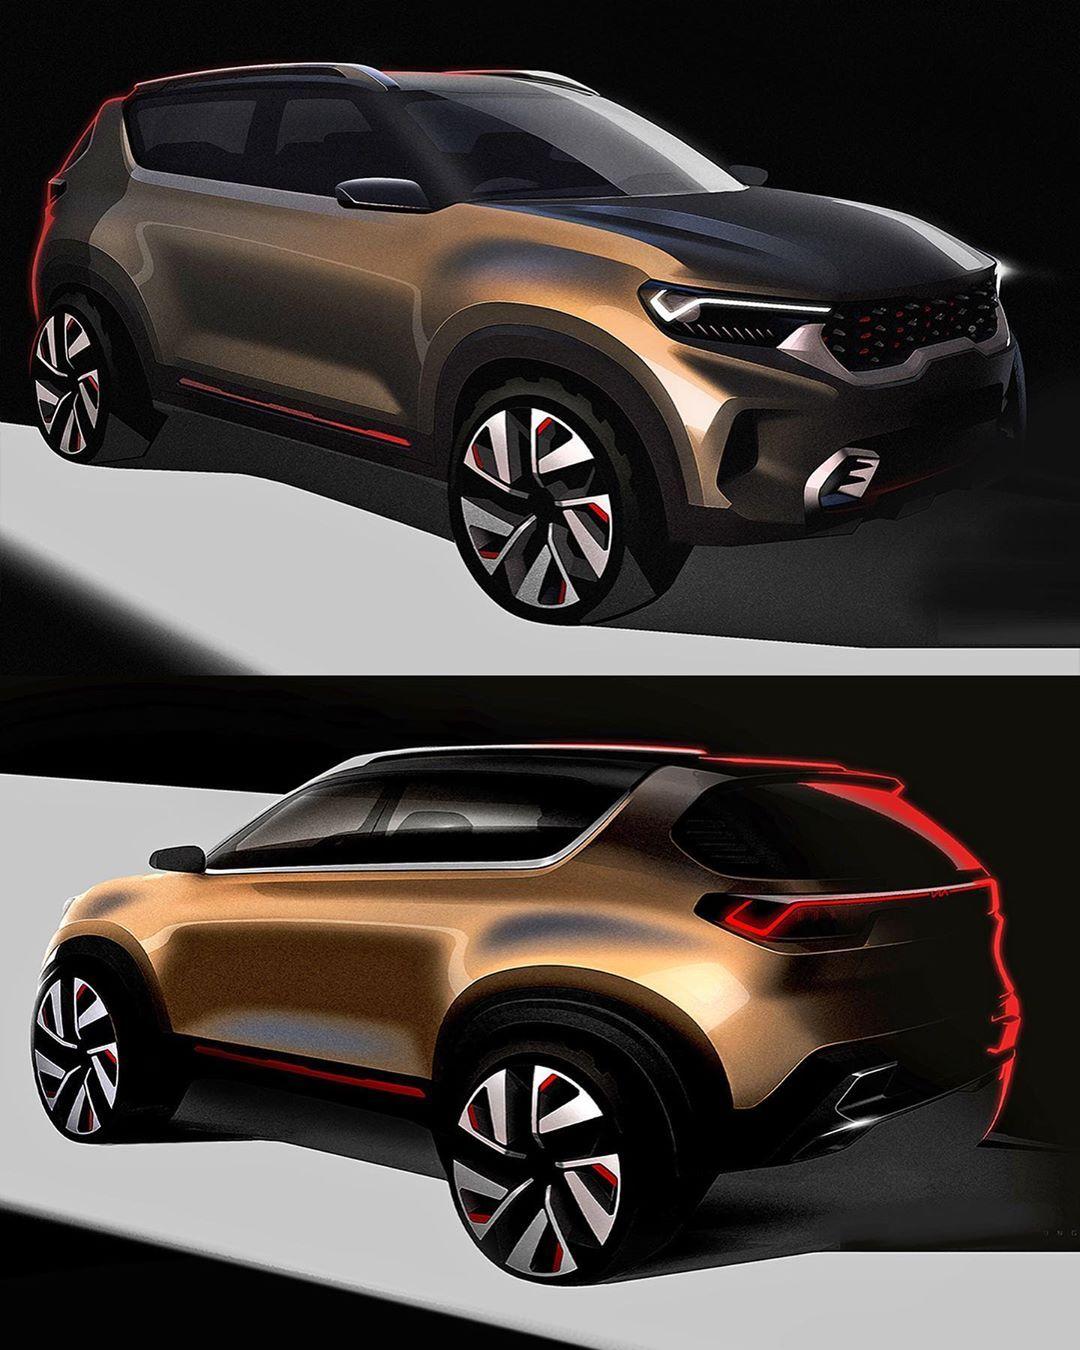 Car Design World On Instagram 2020 Kia Compact Suv Concept